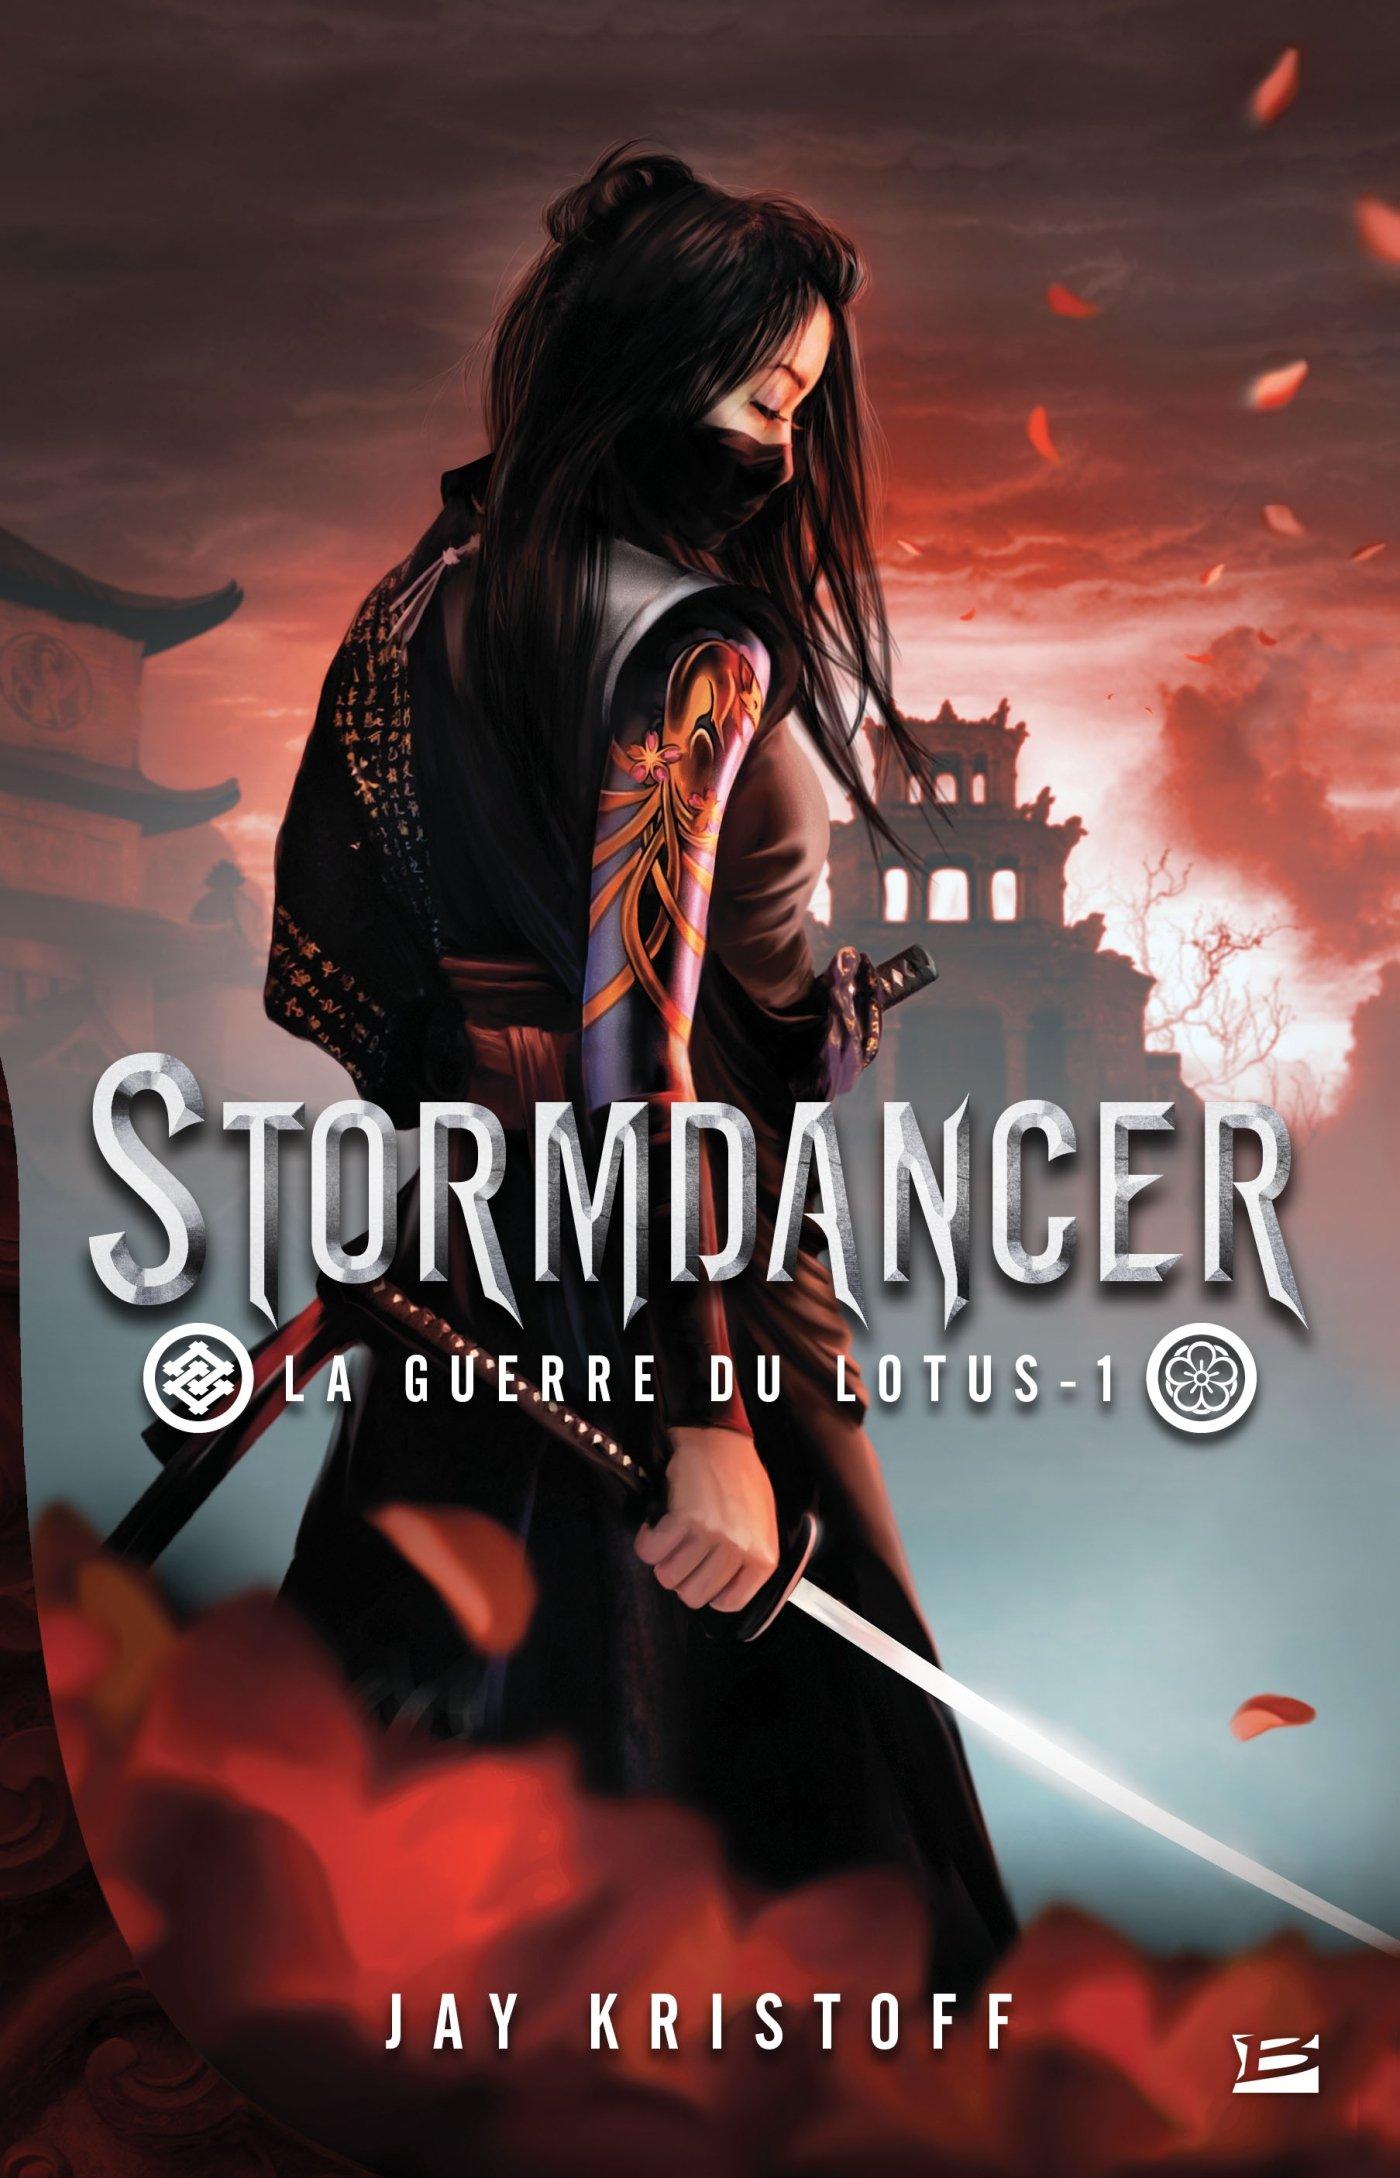 Stormdancer La guerre du lotus